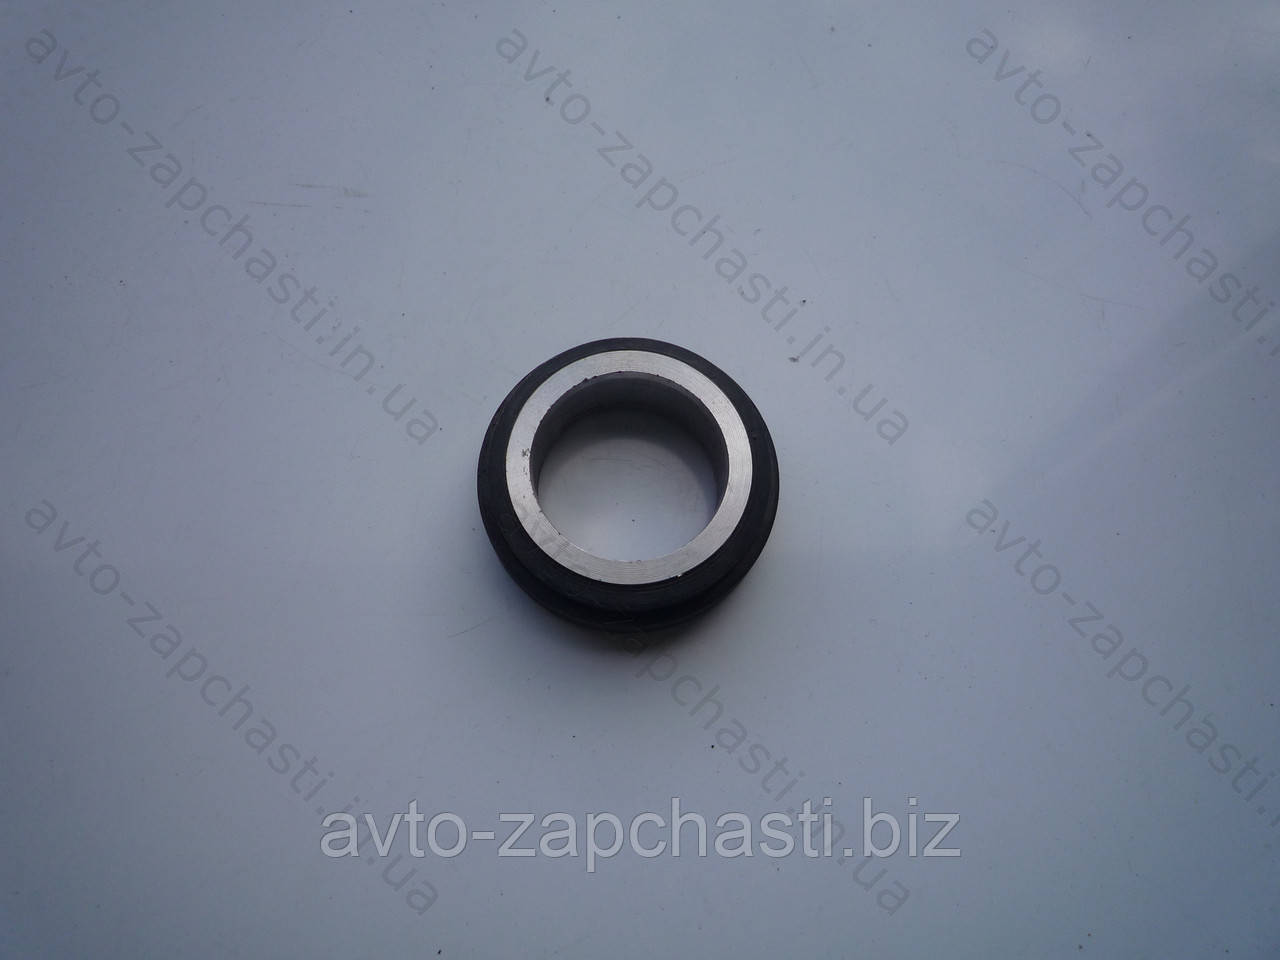 Кольцо запорное полуоси ВАЗ 2101 (пр-во АвтоВАЗ) (21010-240308400)